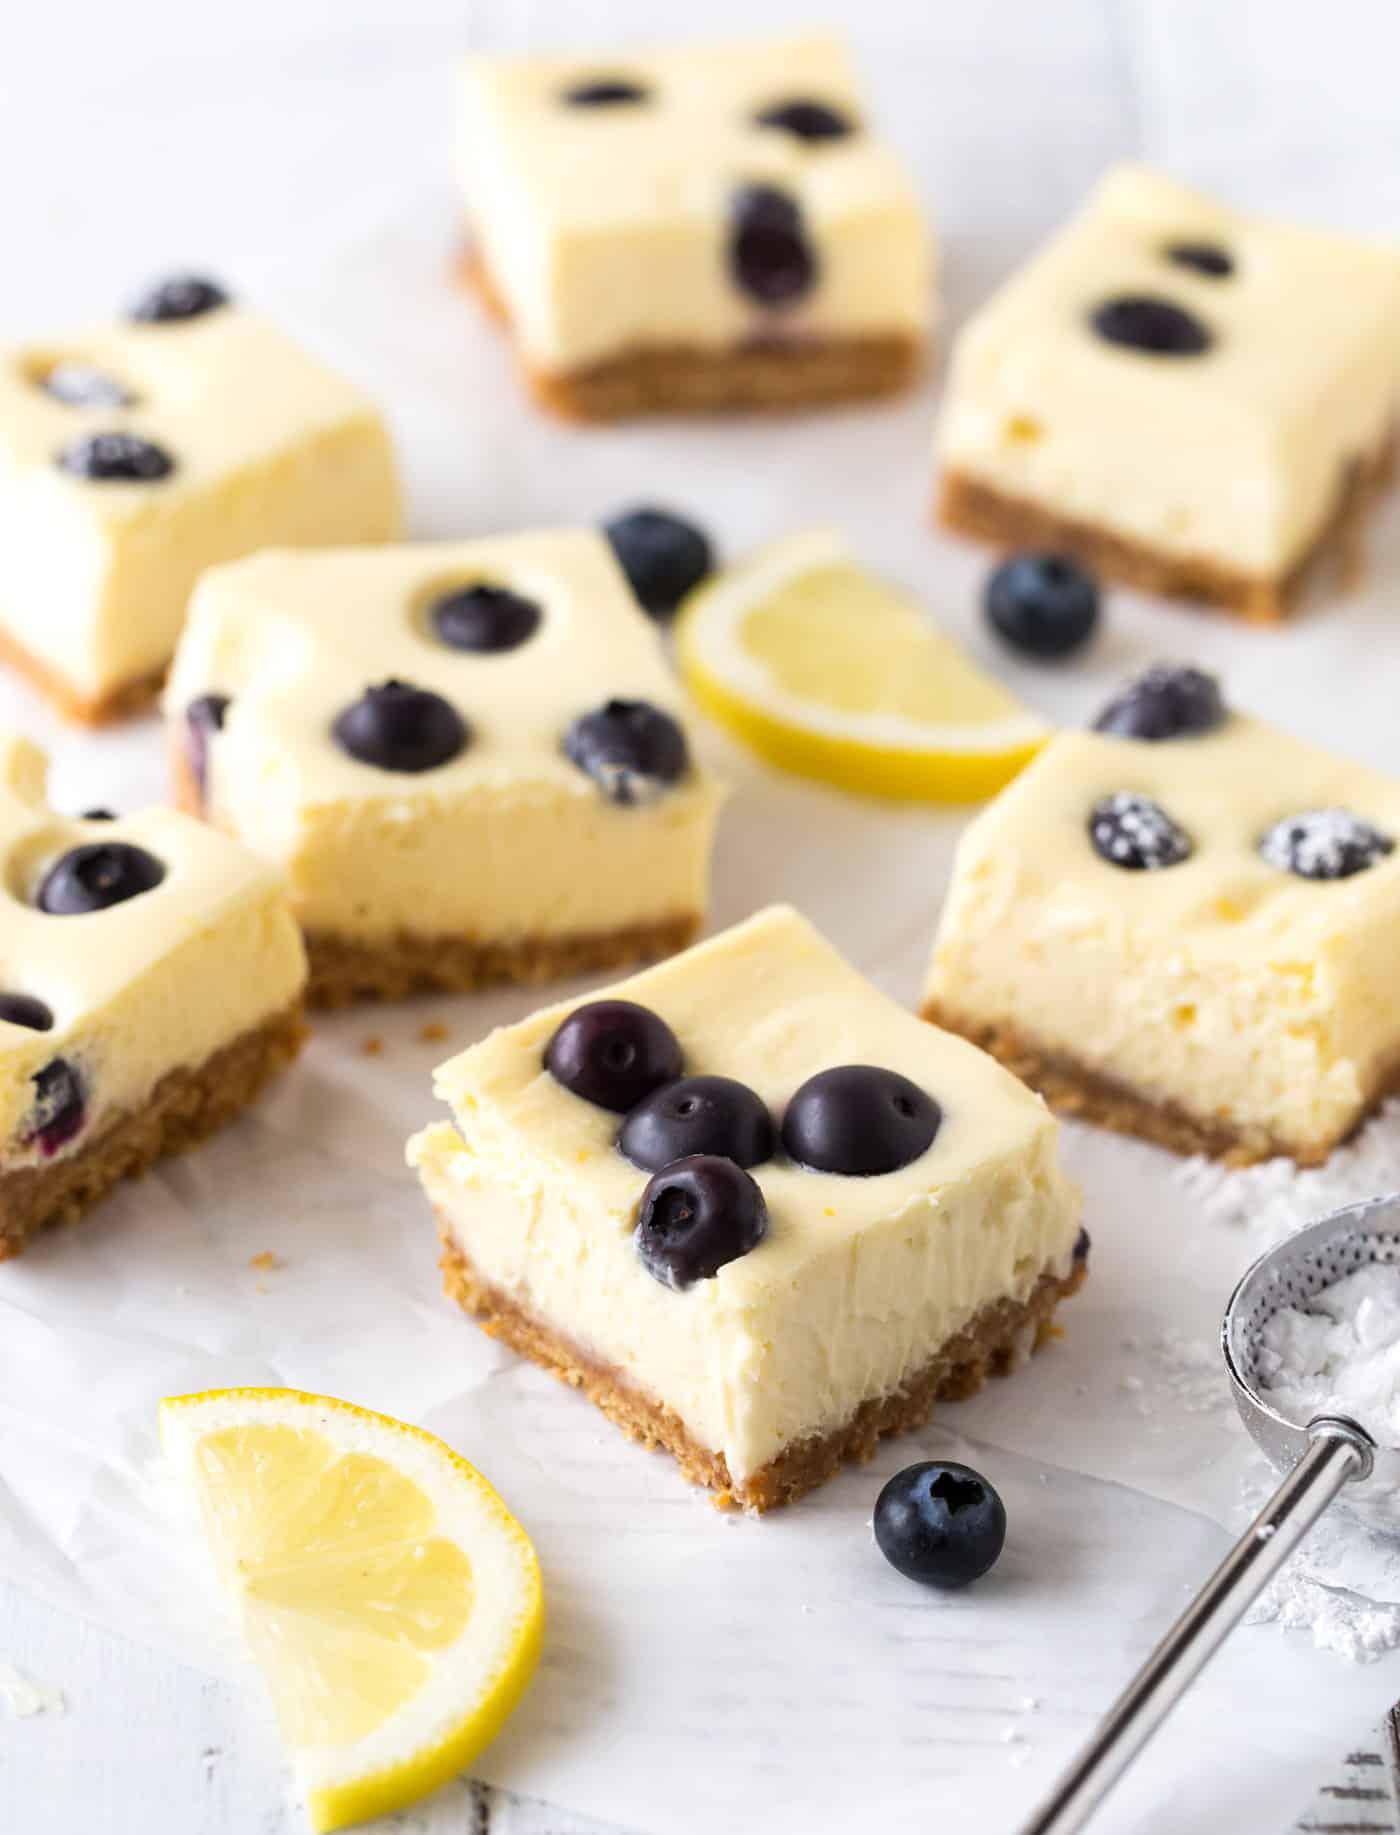 lemon blueberry cheesecake bars with fresh blueberries and lemon slices for garnish.